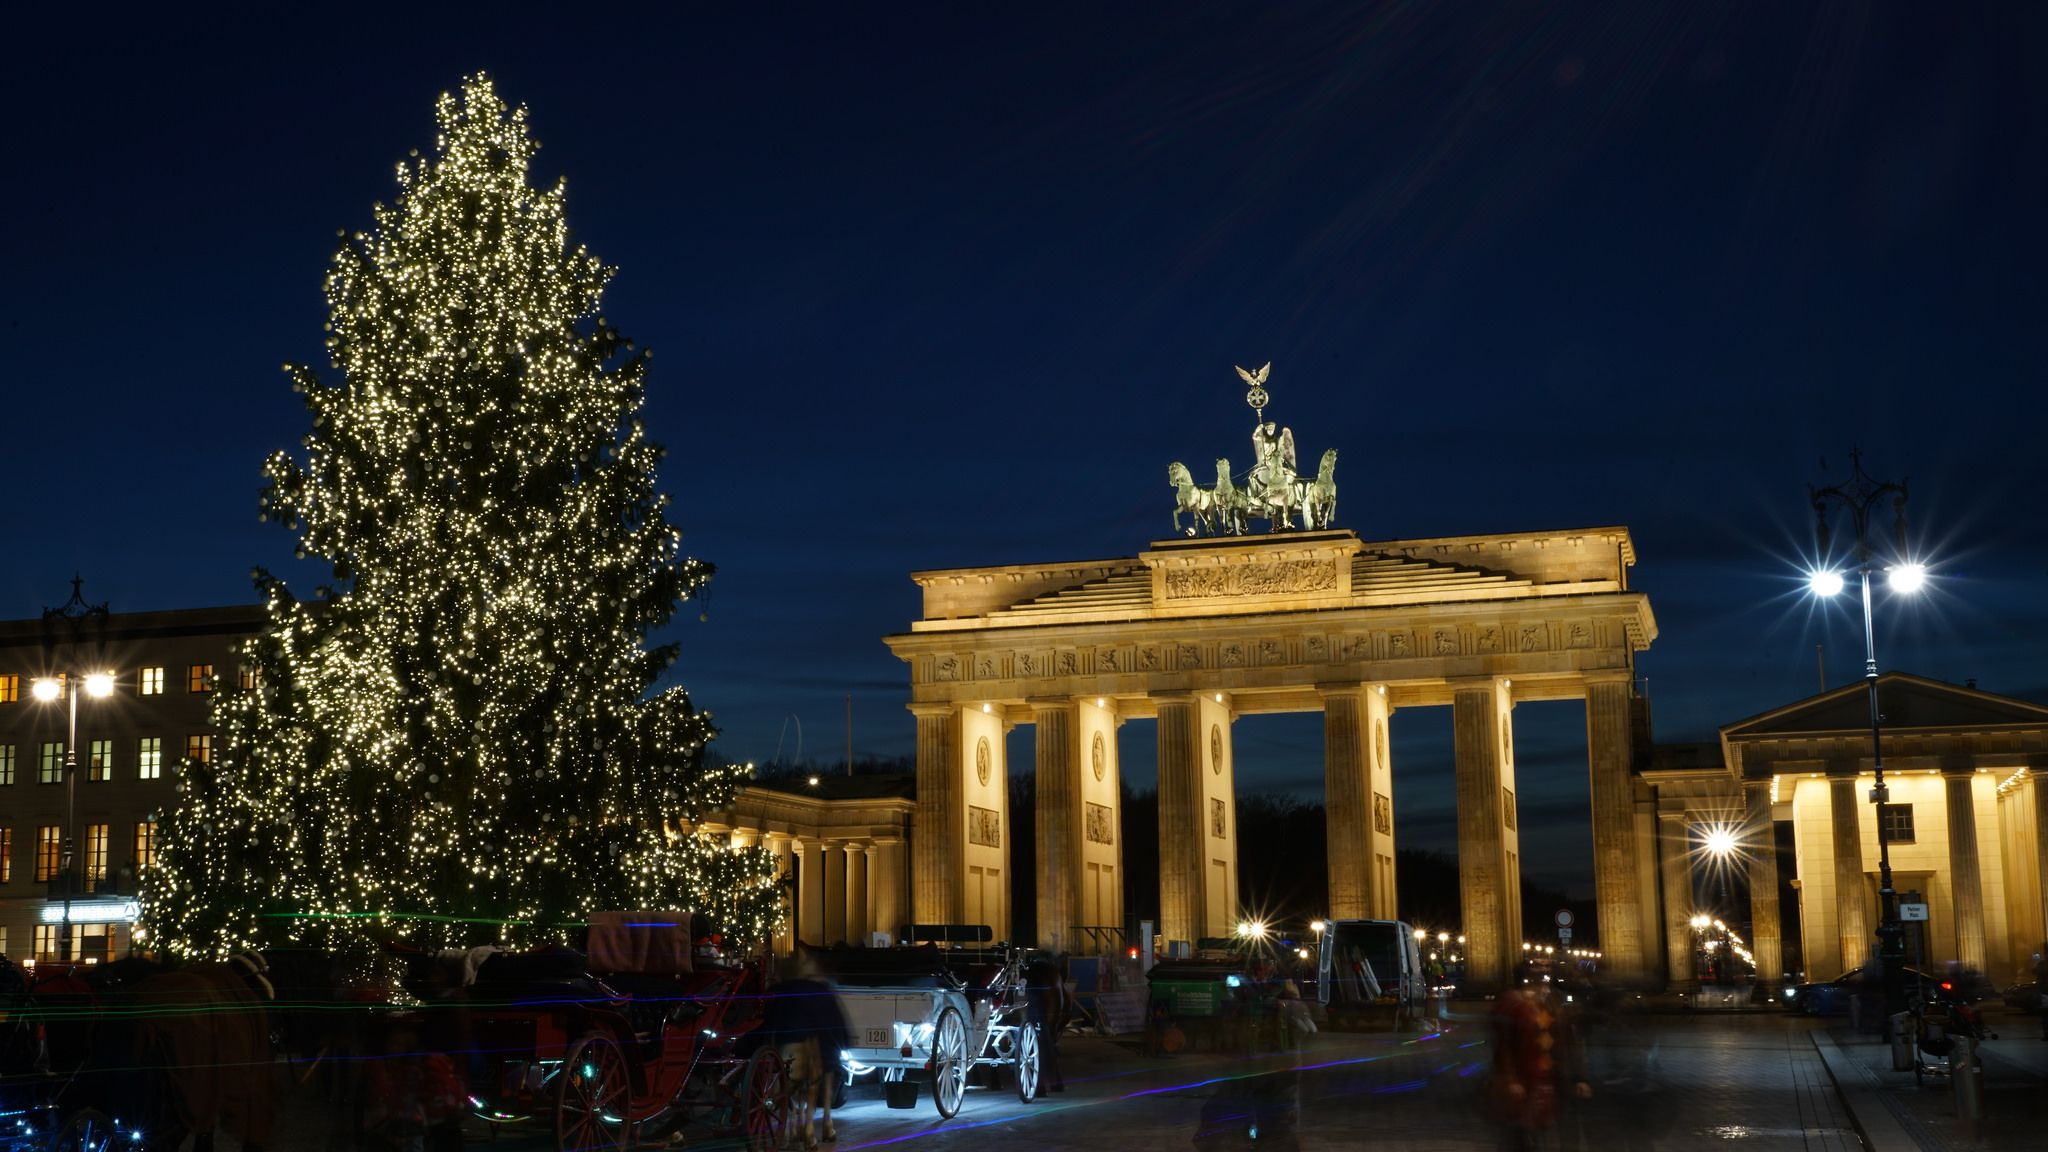 Weihnachten In Berlin Brandenburger Tor Germany Lamp Post Light Box Berlin